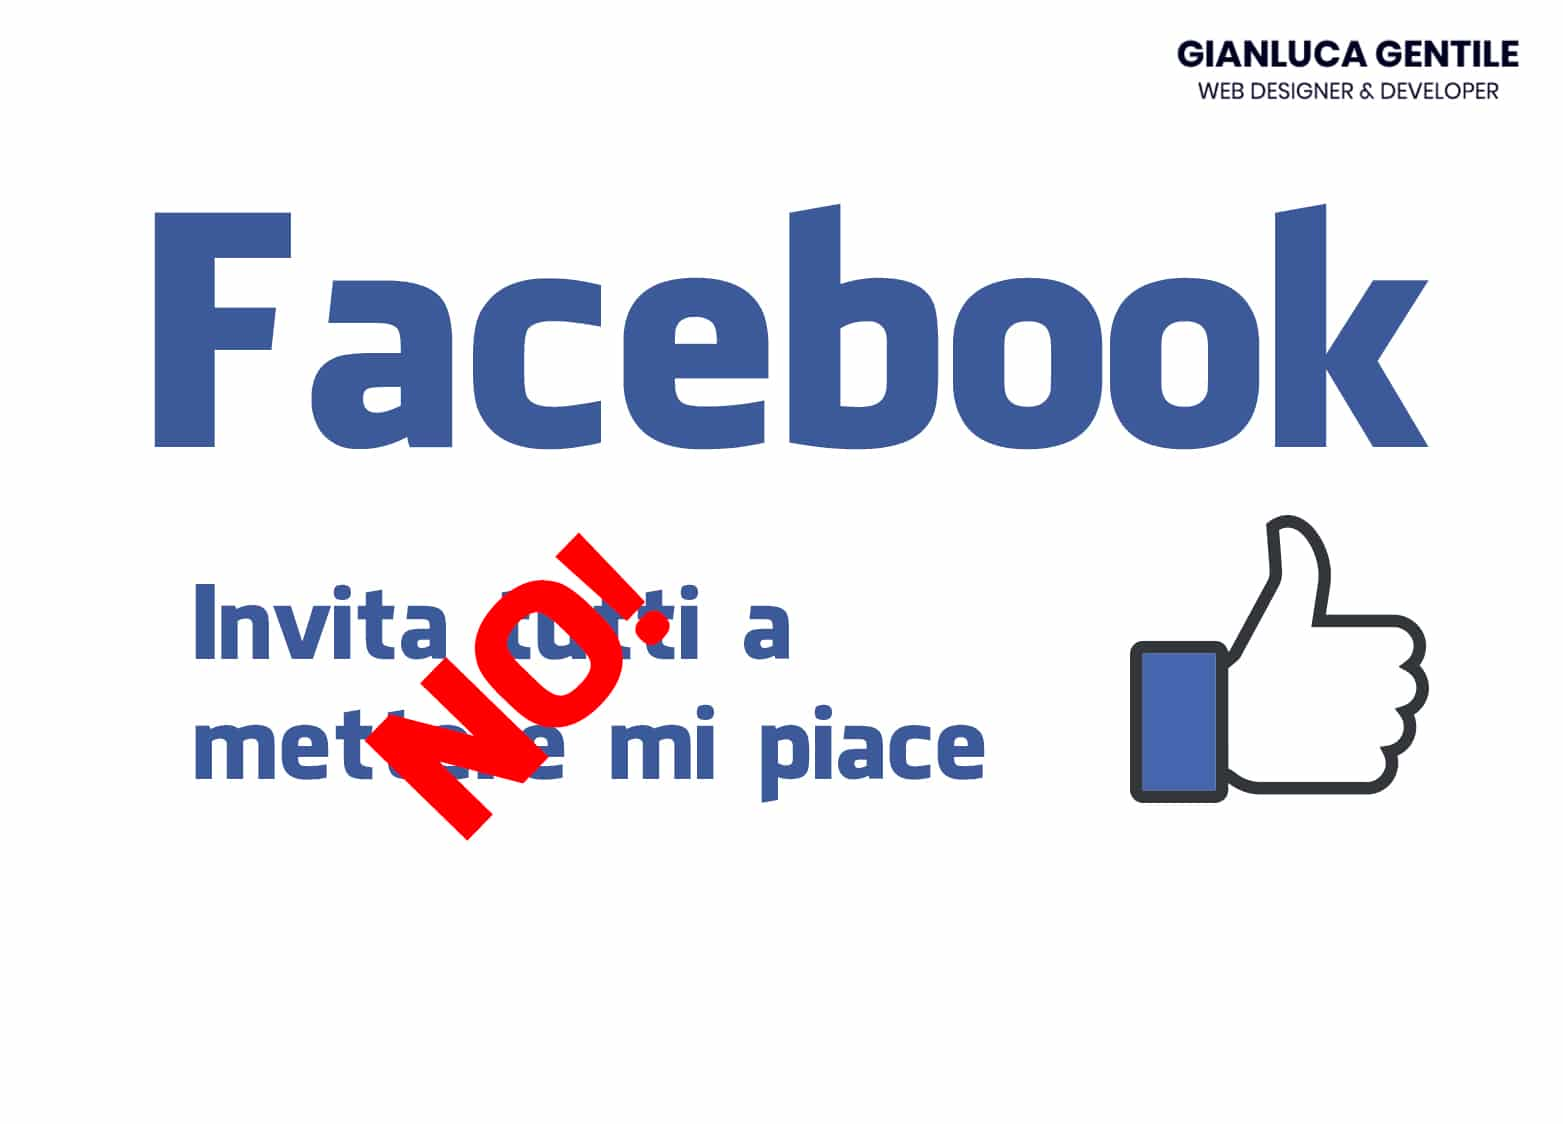 Gianluca Gentile Fan pagina Facebook basta a inviti random 20 Settembre 2018